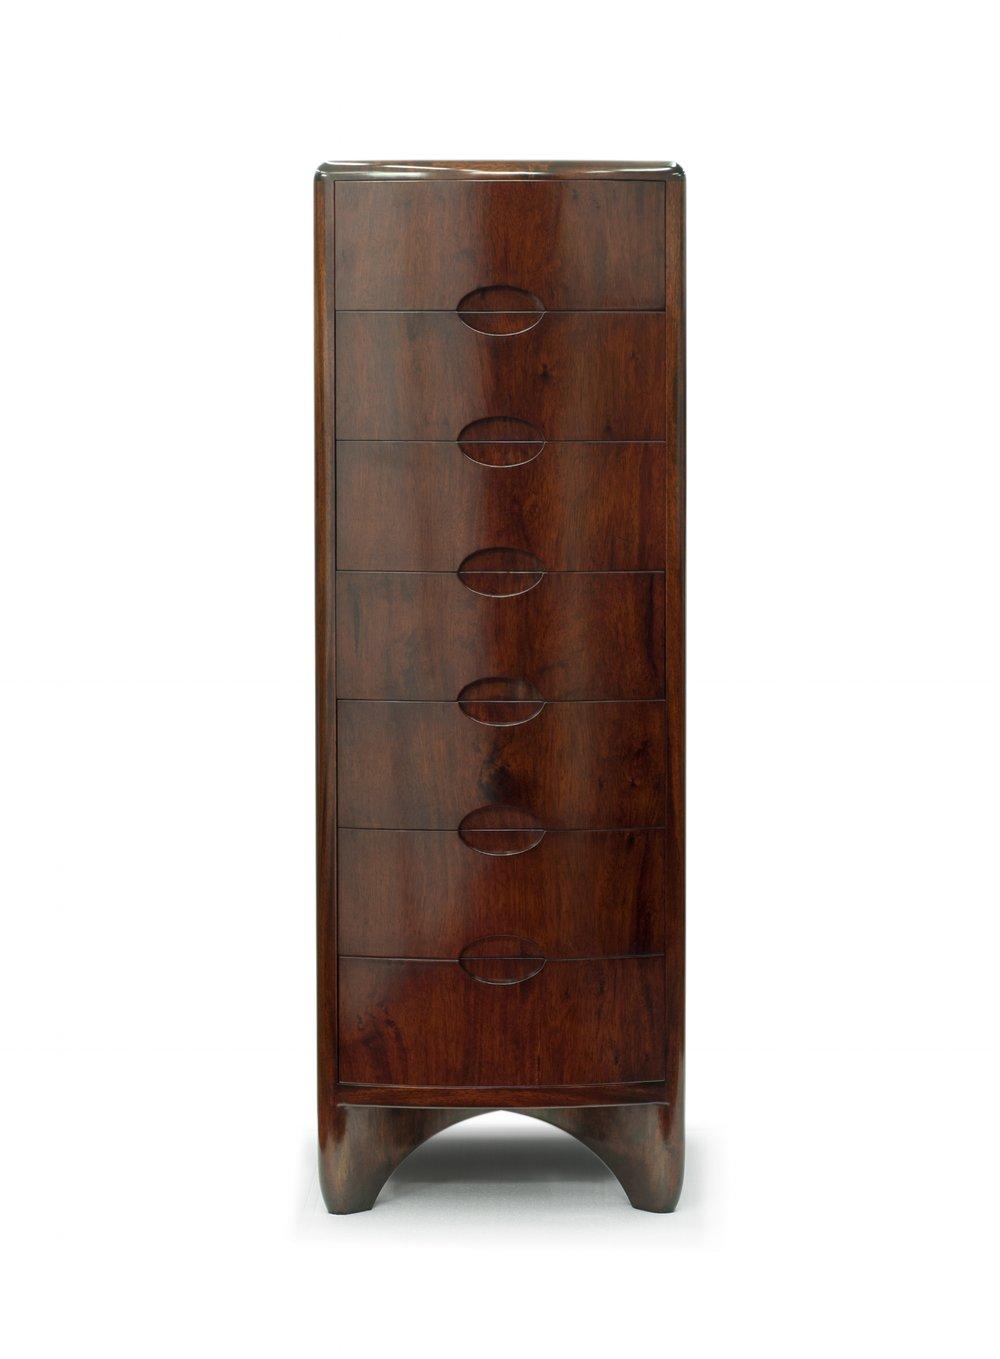 ....Custom made Modern furniture : Chest of drawers..特别定制现代家具:抽屉柜....